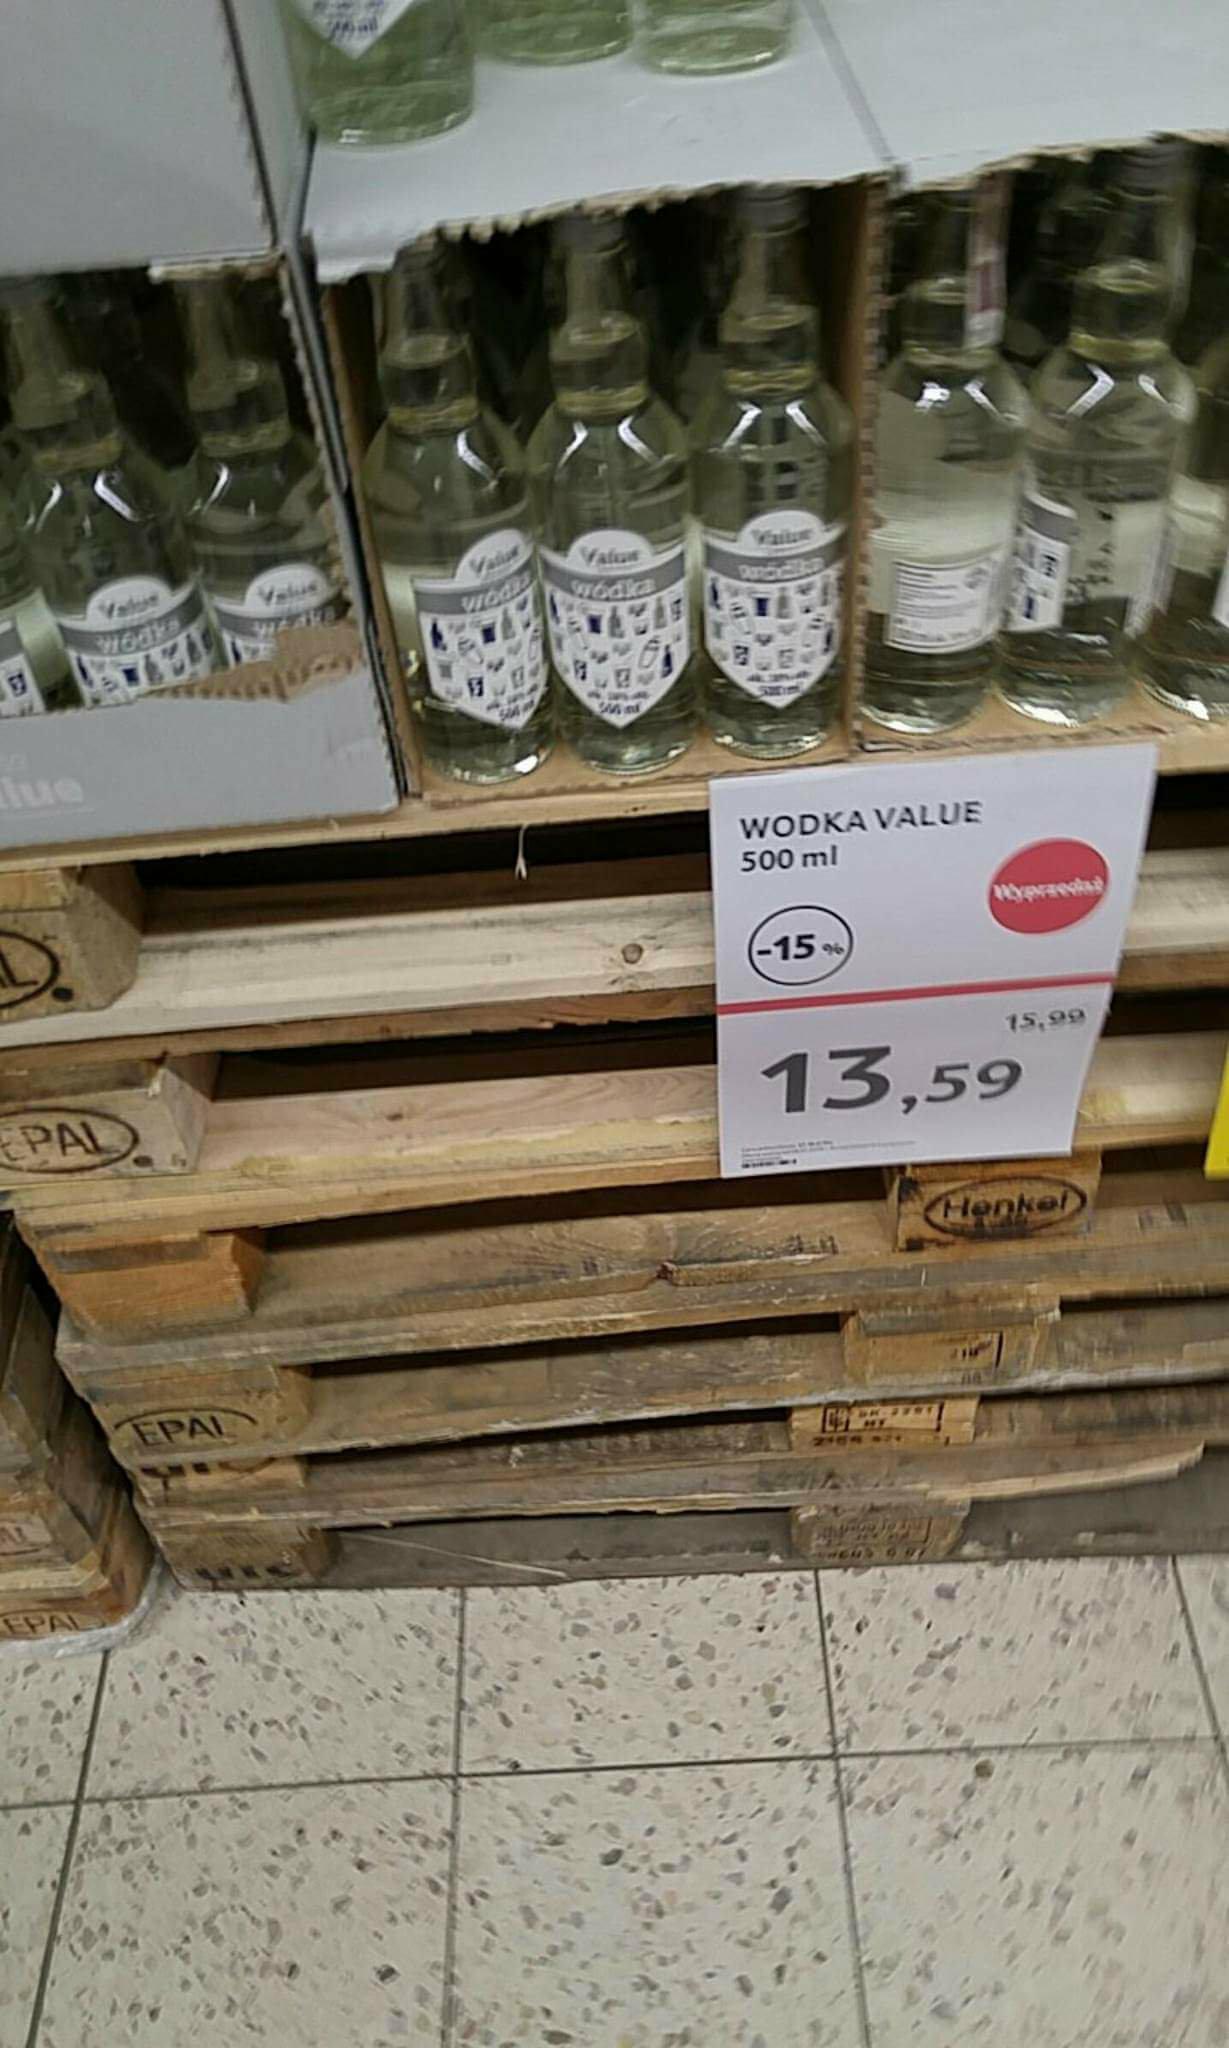 Wódka Tesco Value 0,5 l